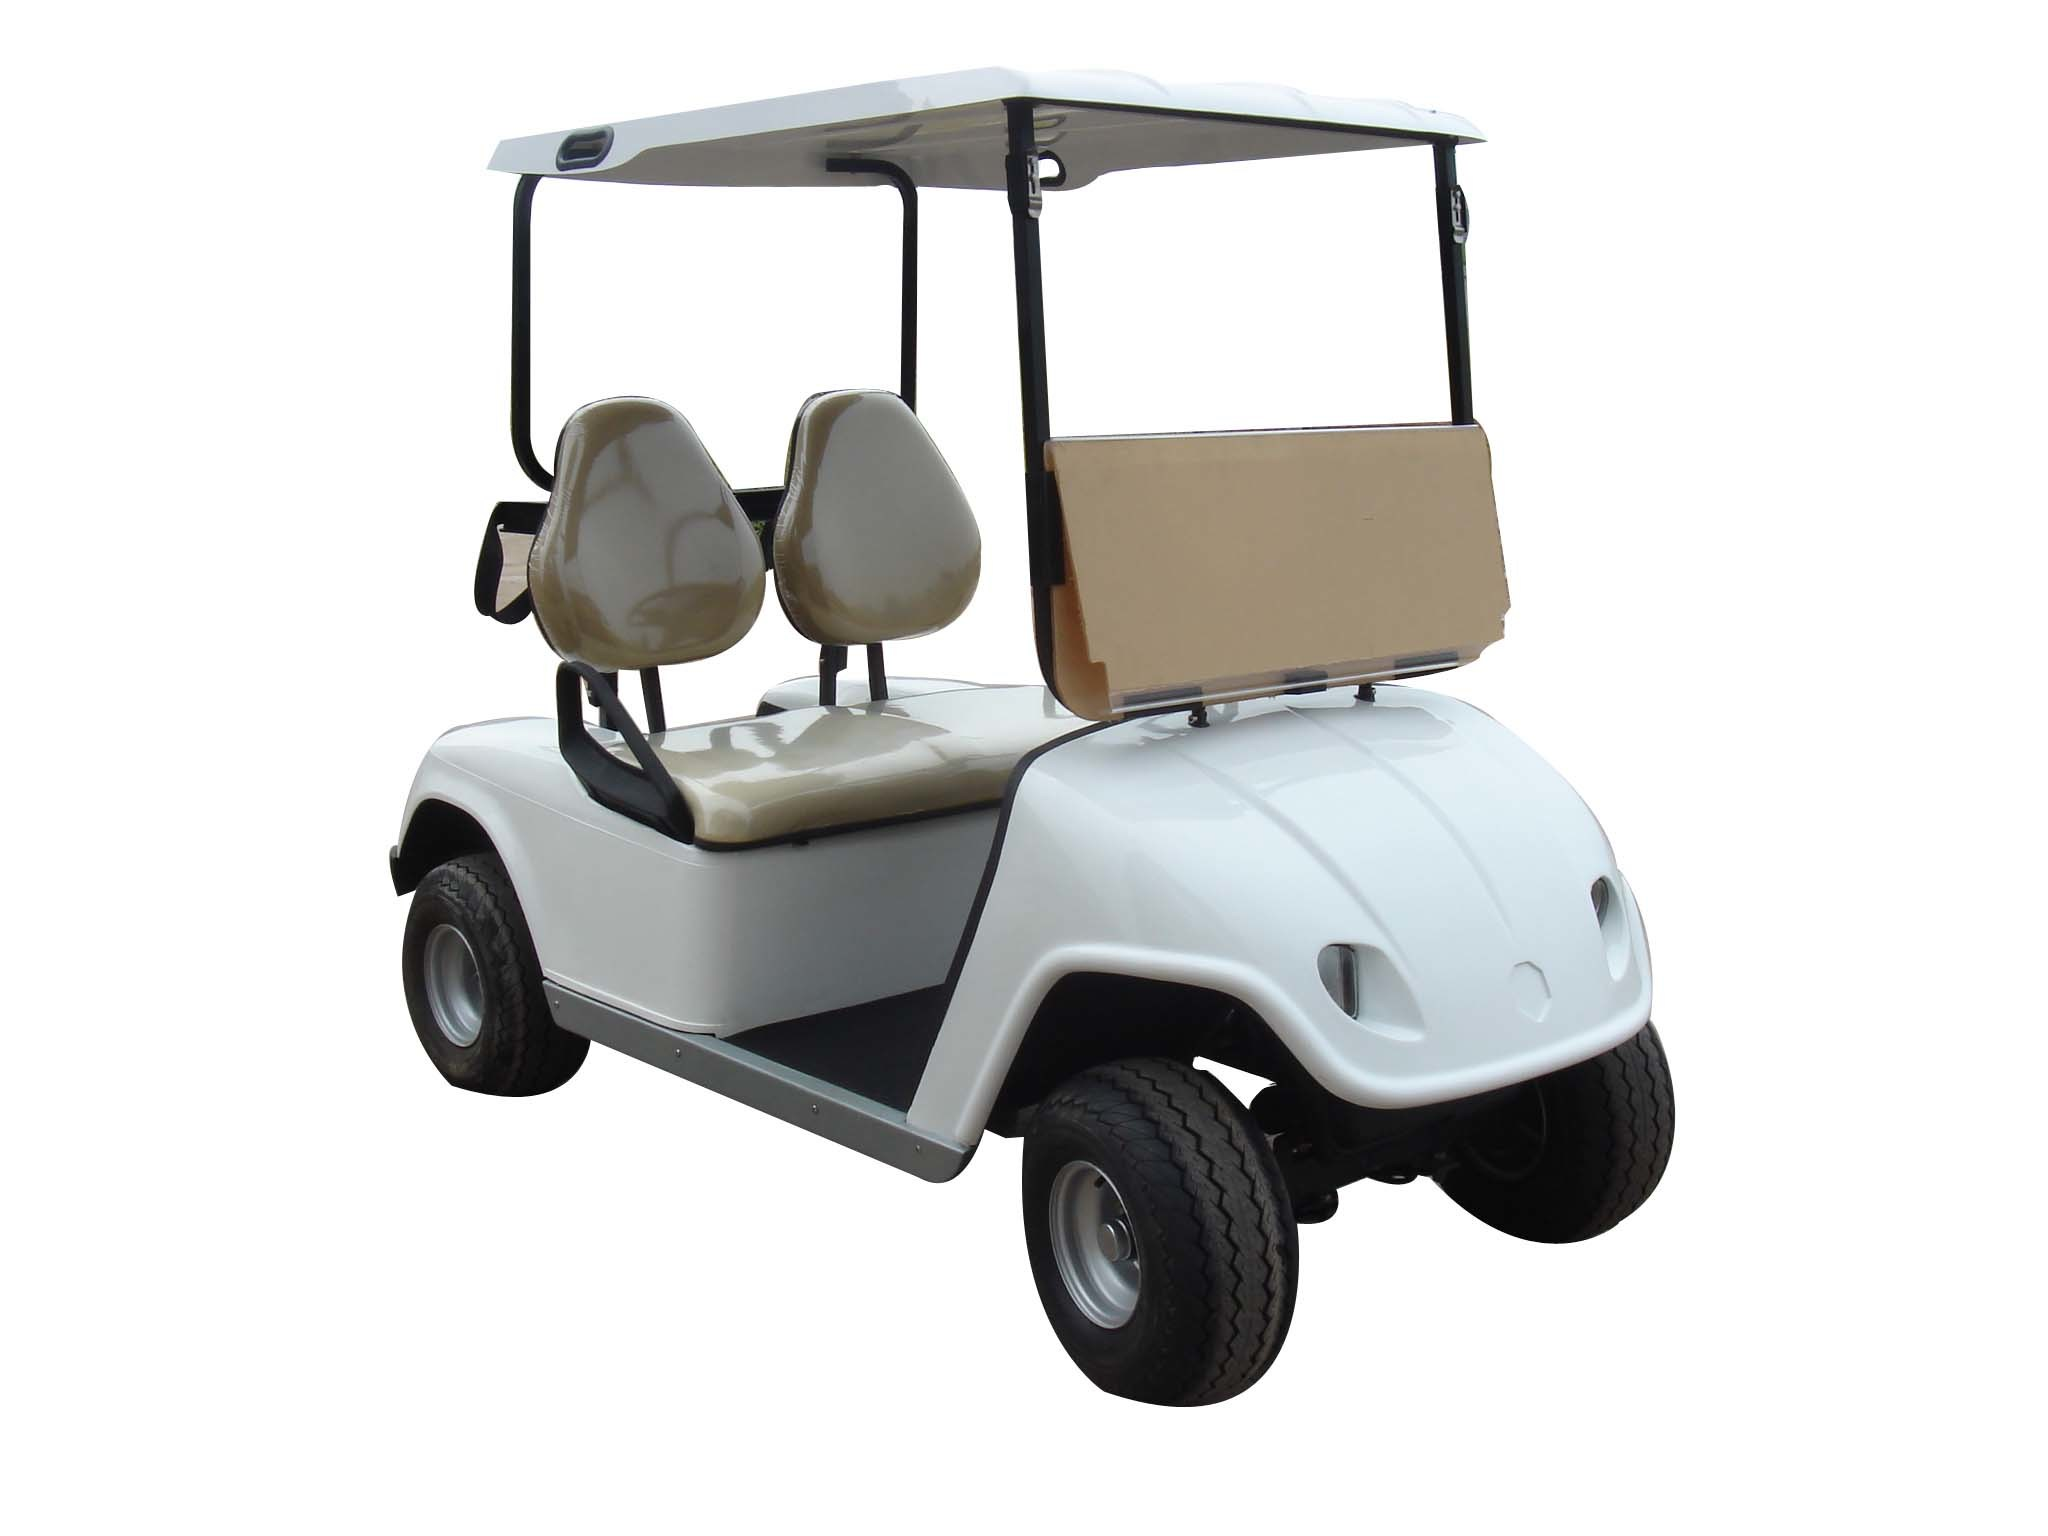 yamaha g9 electric golf cart wiring diagram universal fridge thermostat g16 electric, yamaha, free engine image for user manual download